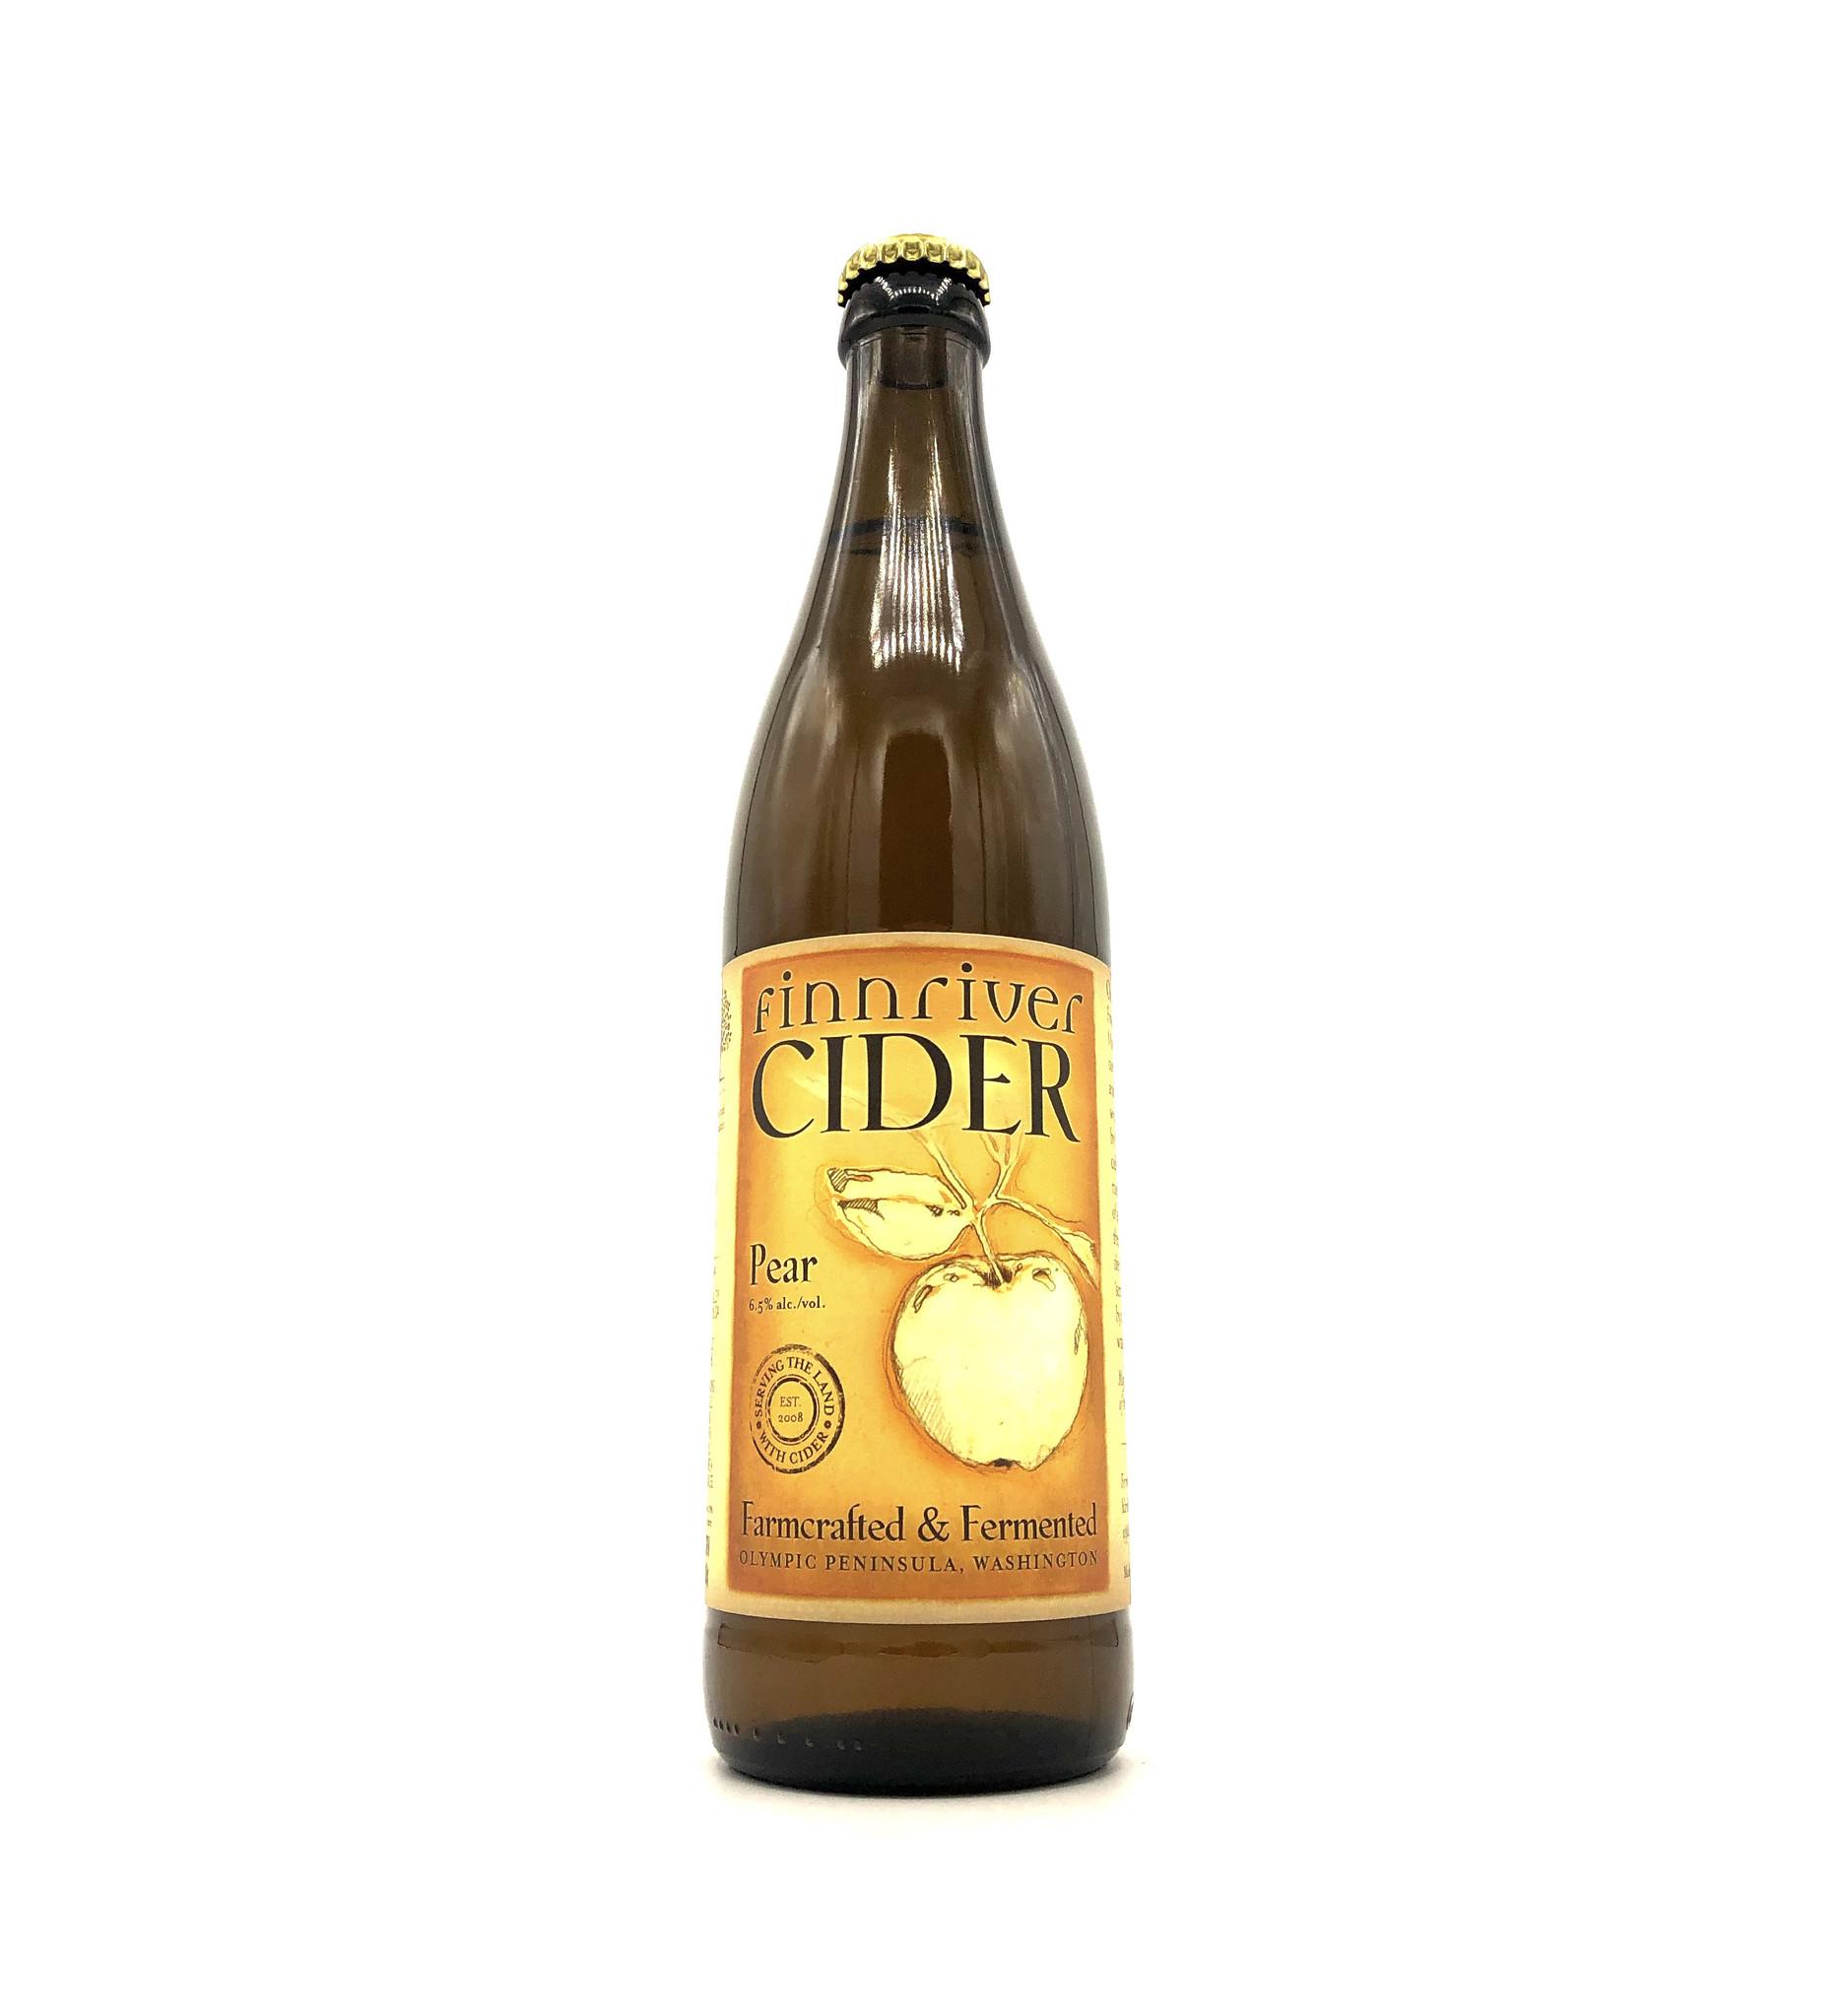 Sparkling Pear Cider 500ml Finnriver Cidery